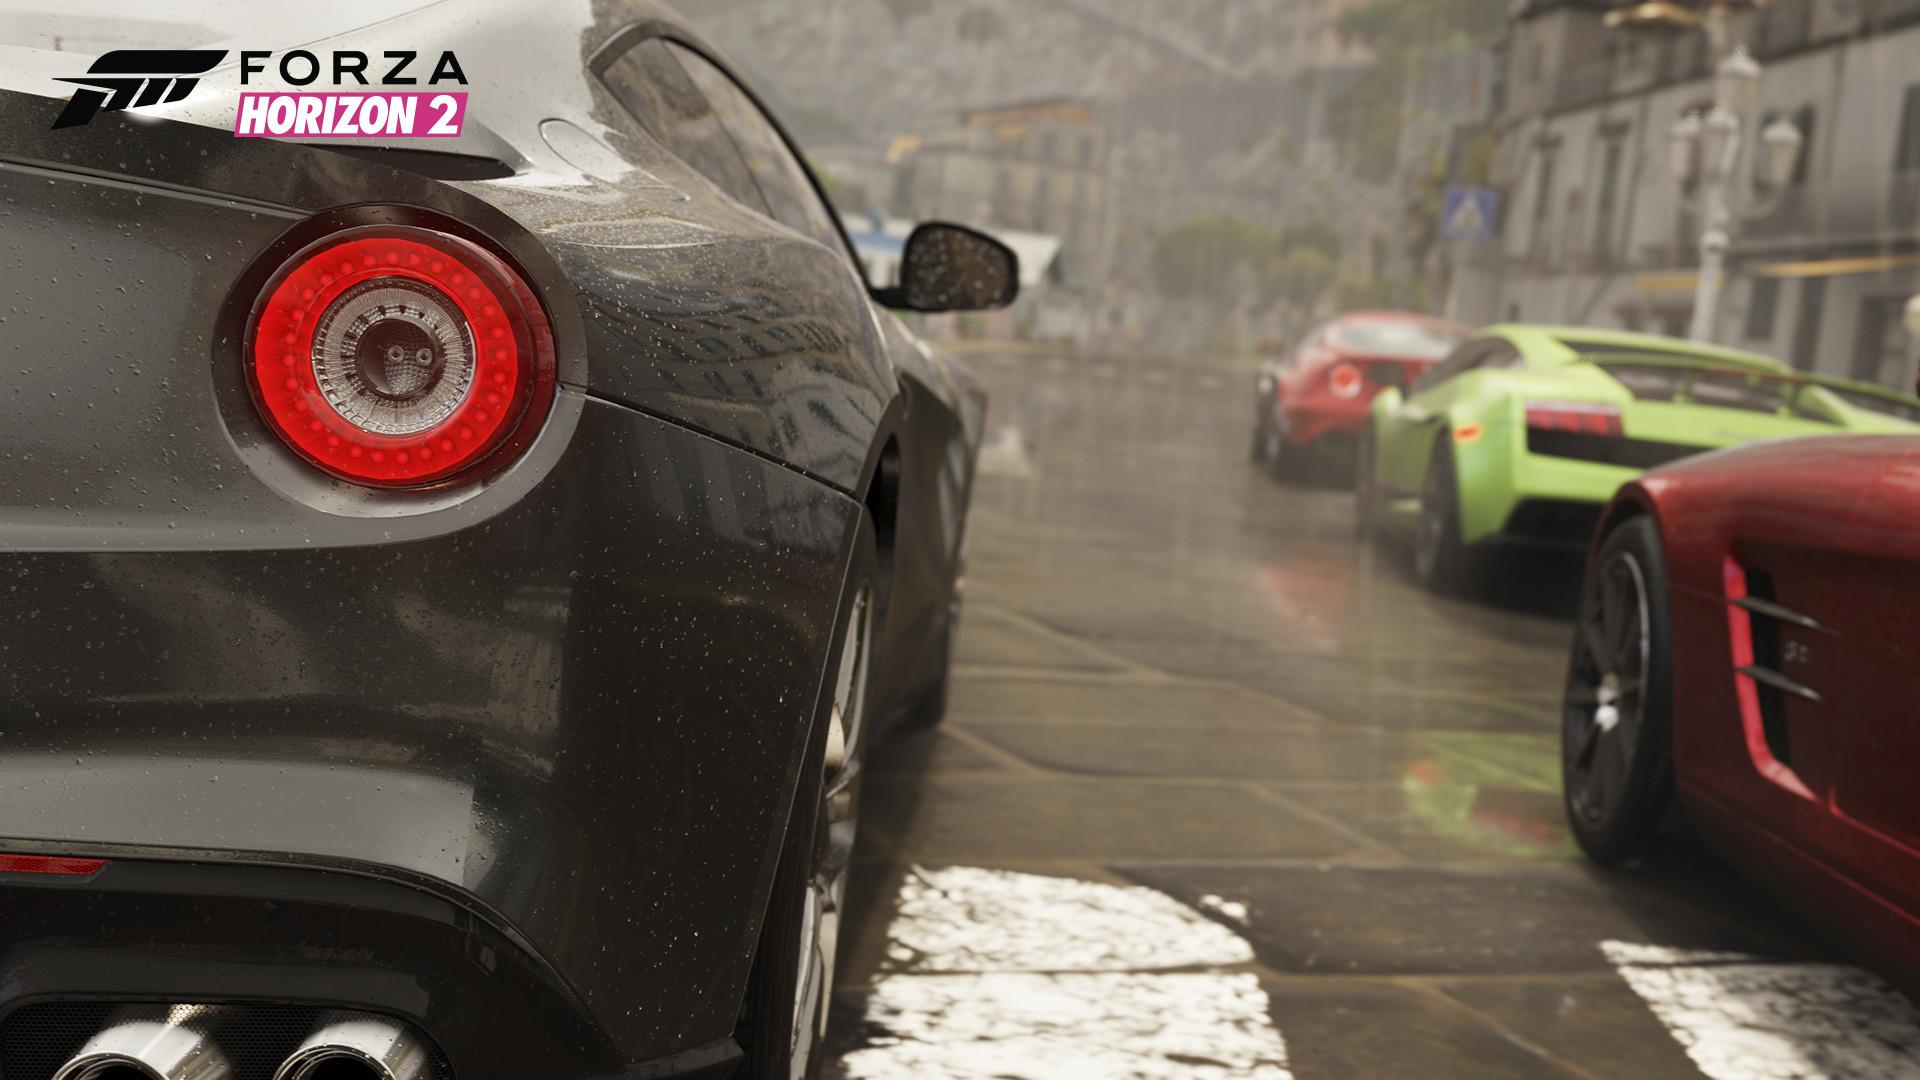 screenshot_3 Elegant Lamborghini Huracan forza Horizon 2 Cars Trend